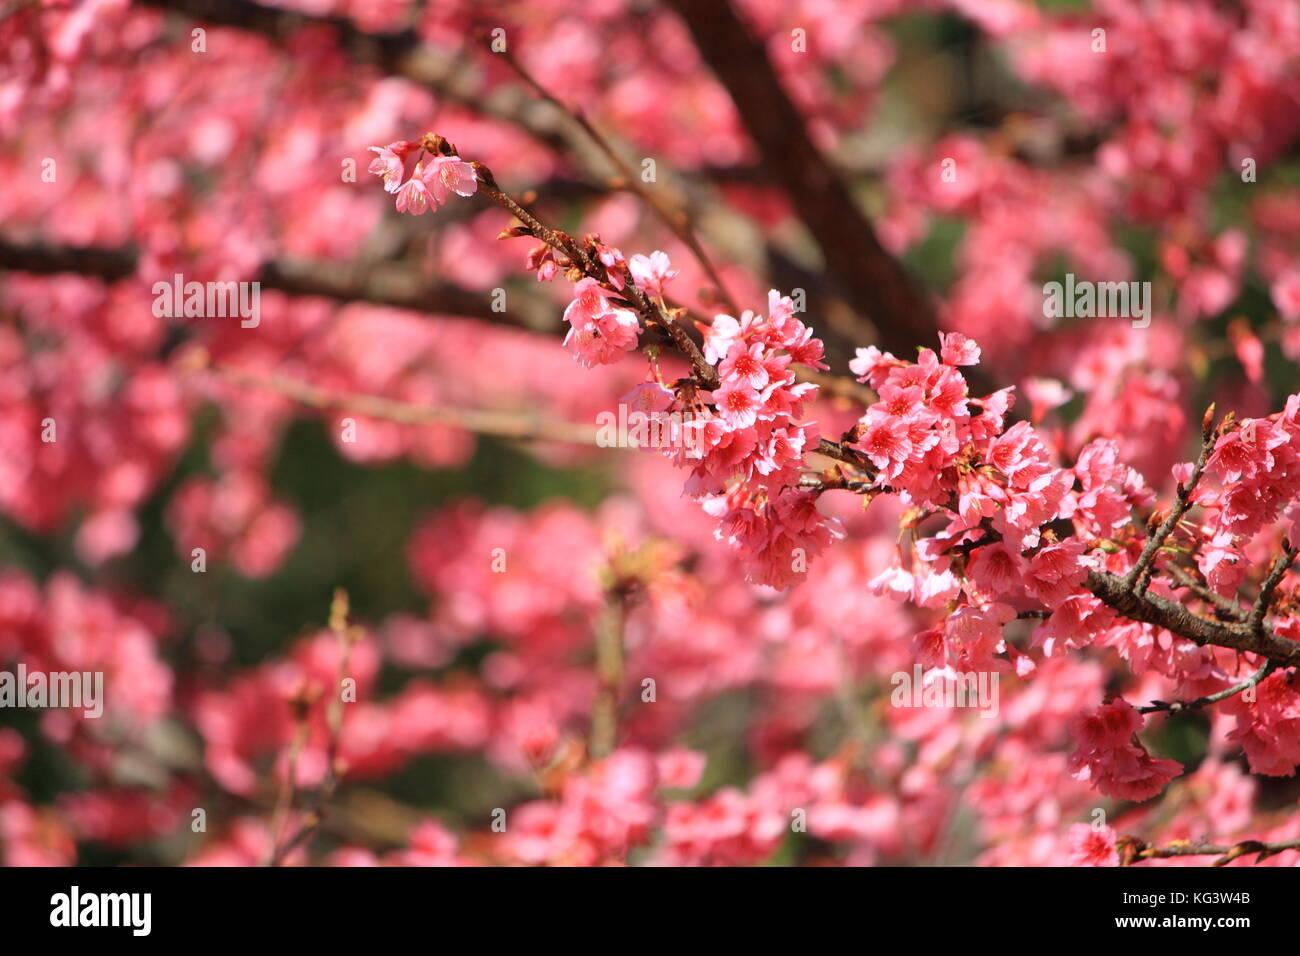 Pink Flower Chinese Plum Japanese Apricot Prunus Mume Stock Photo